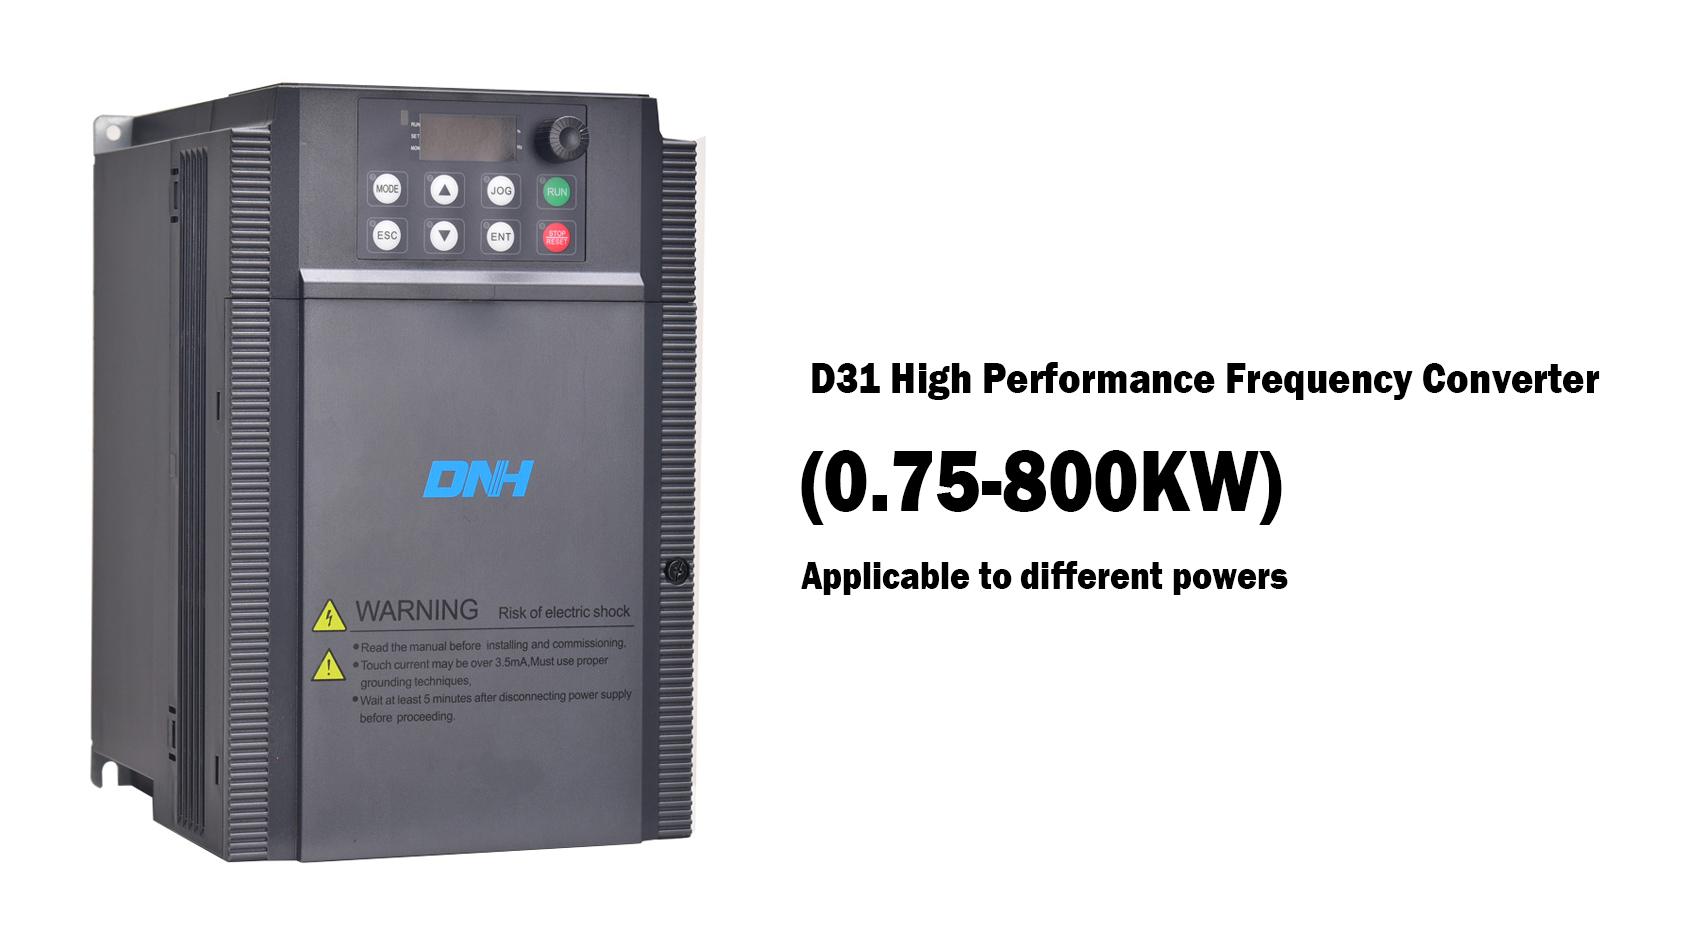 0.75-800KW 380V 3 phase input 3 phase output  inverter power inverter 60hz 50hz Variable Frequency Converters china vfd